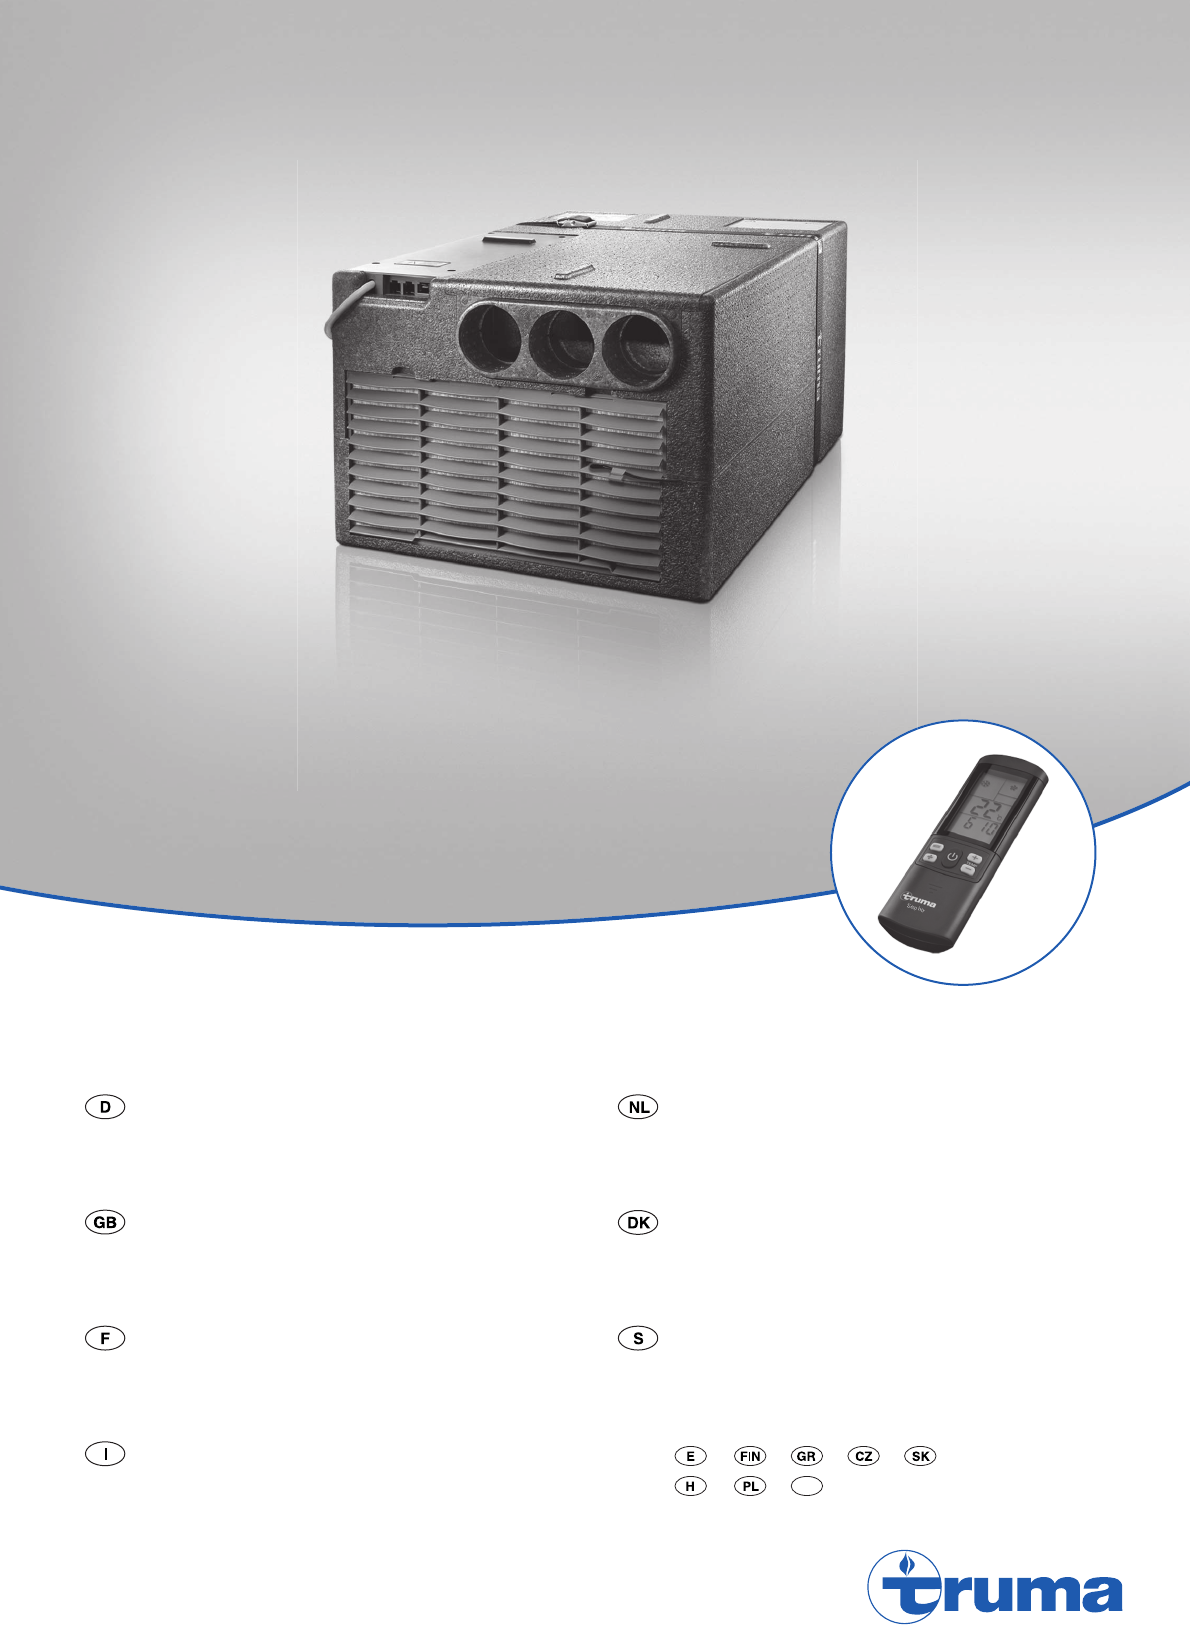 GASKET TRUMA ELECTRIC MAINS 240 VOLT HOUSING OUTLET BOX 3 PIN SOCKET WHITE